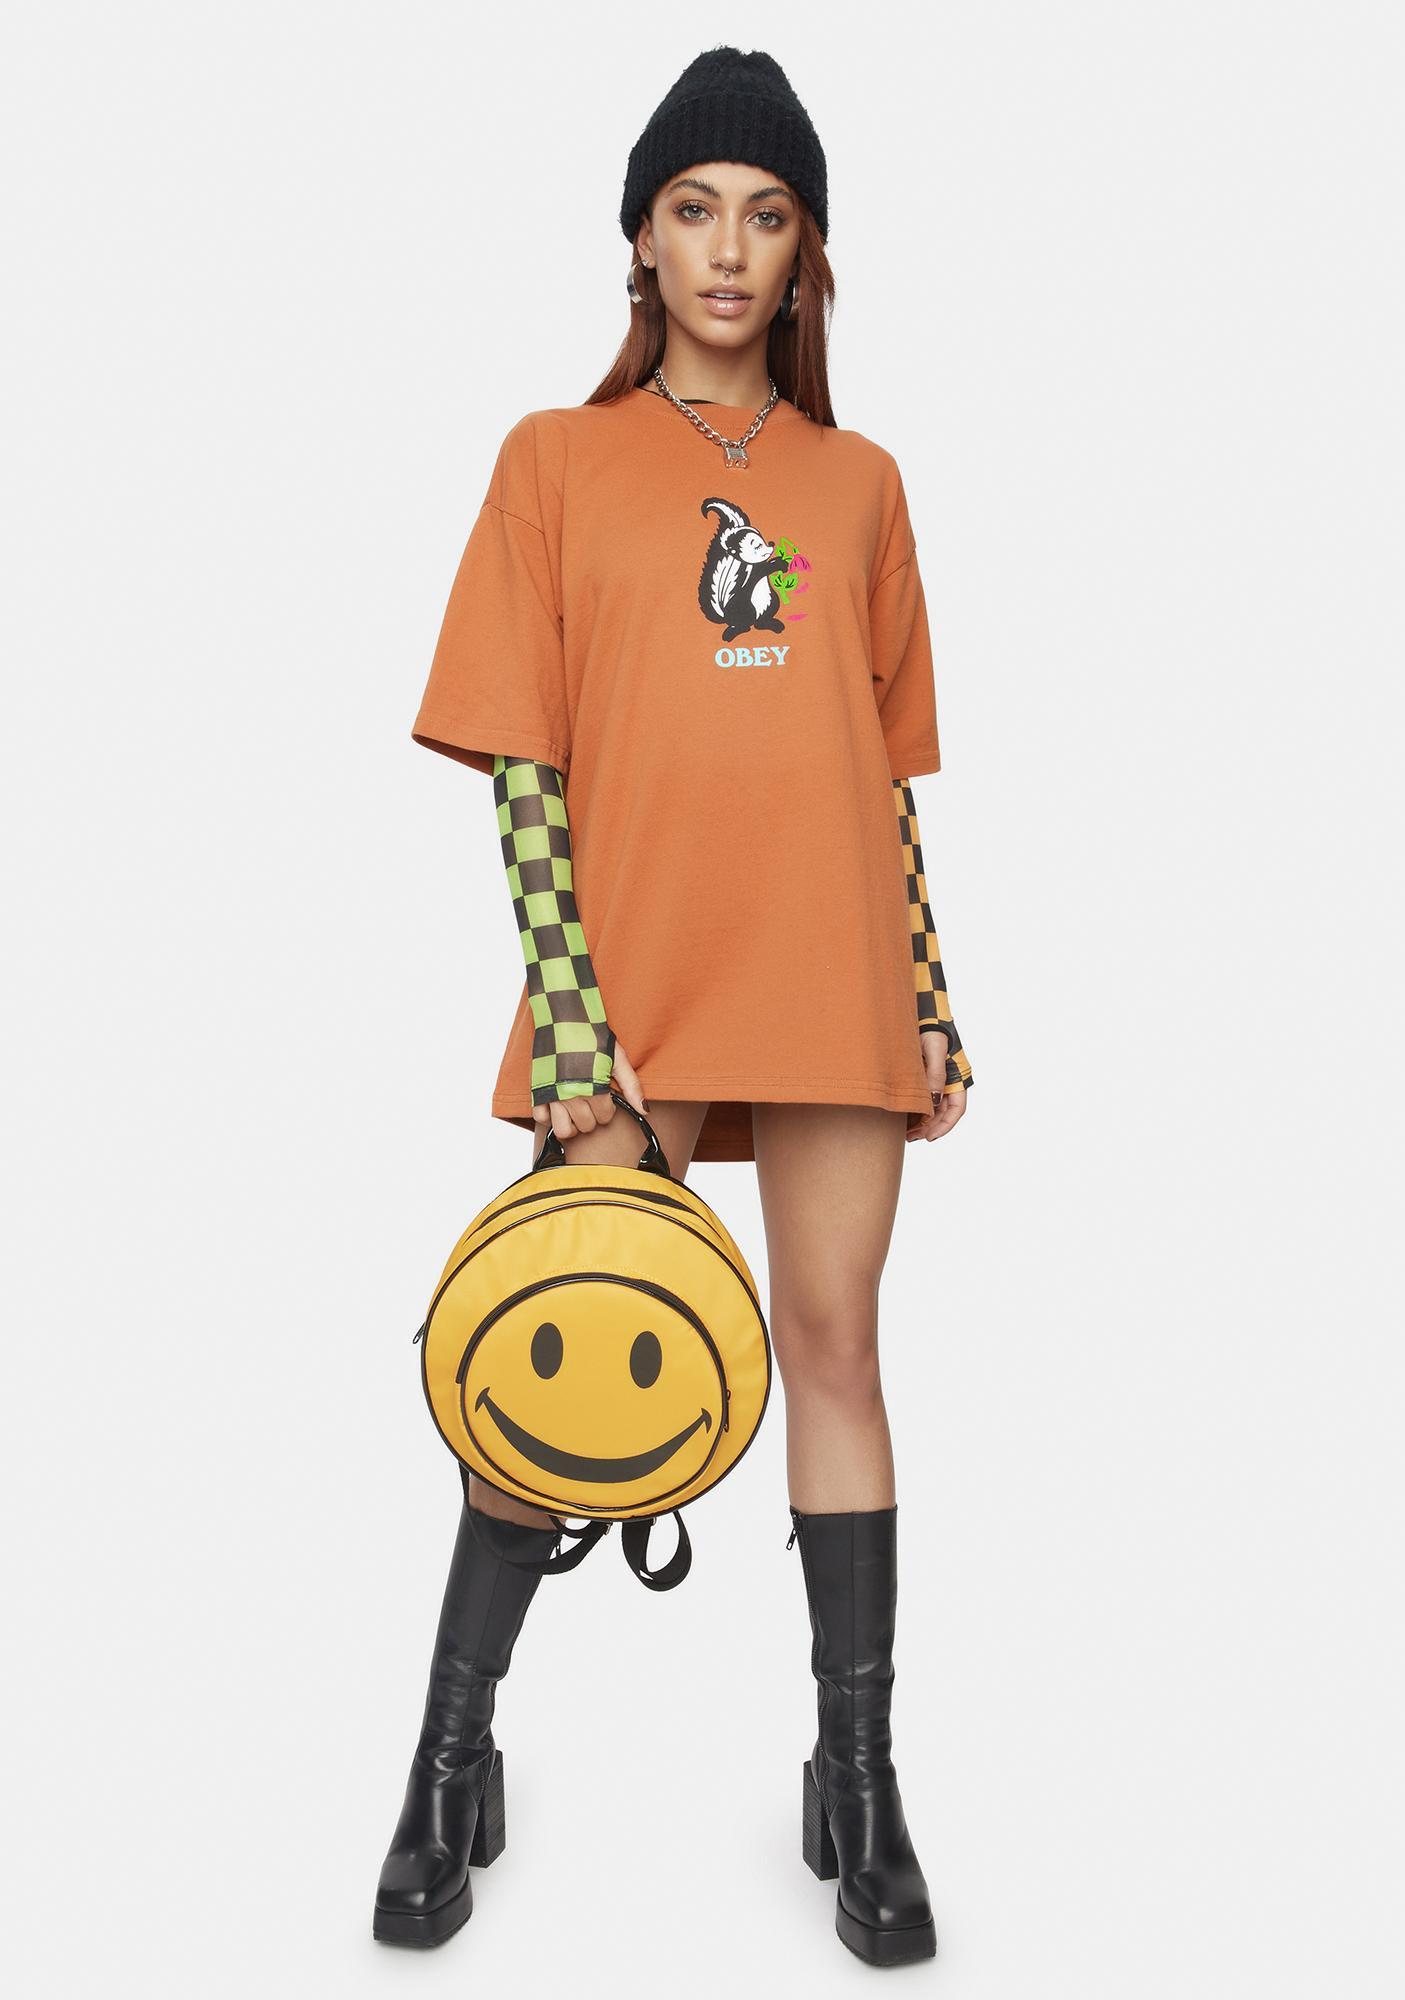 Obey Pumpkin Spice Love Stinks Graphic Tee